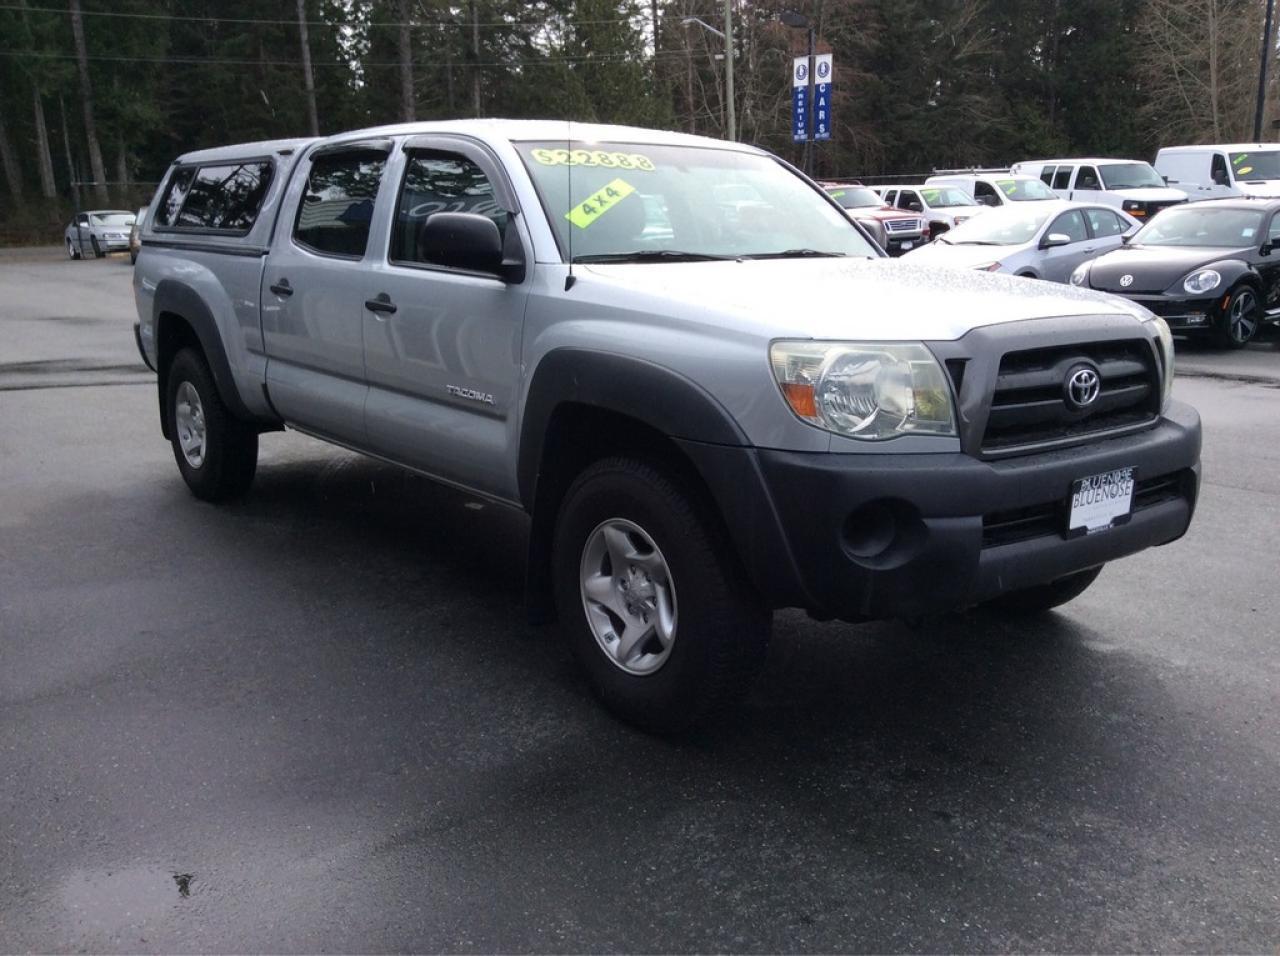 Photo of Silver 2006 Toyota Tacoma